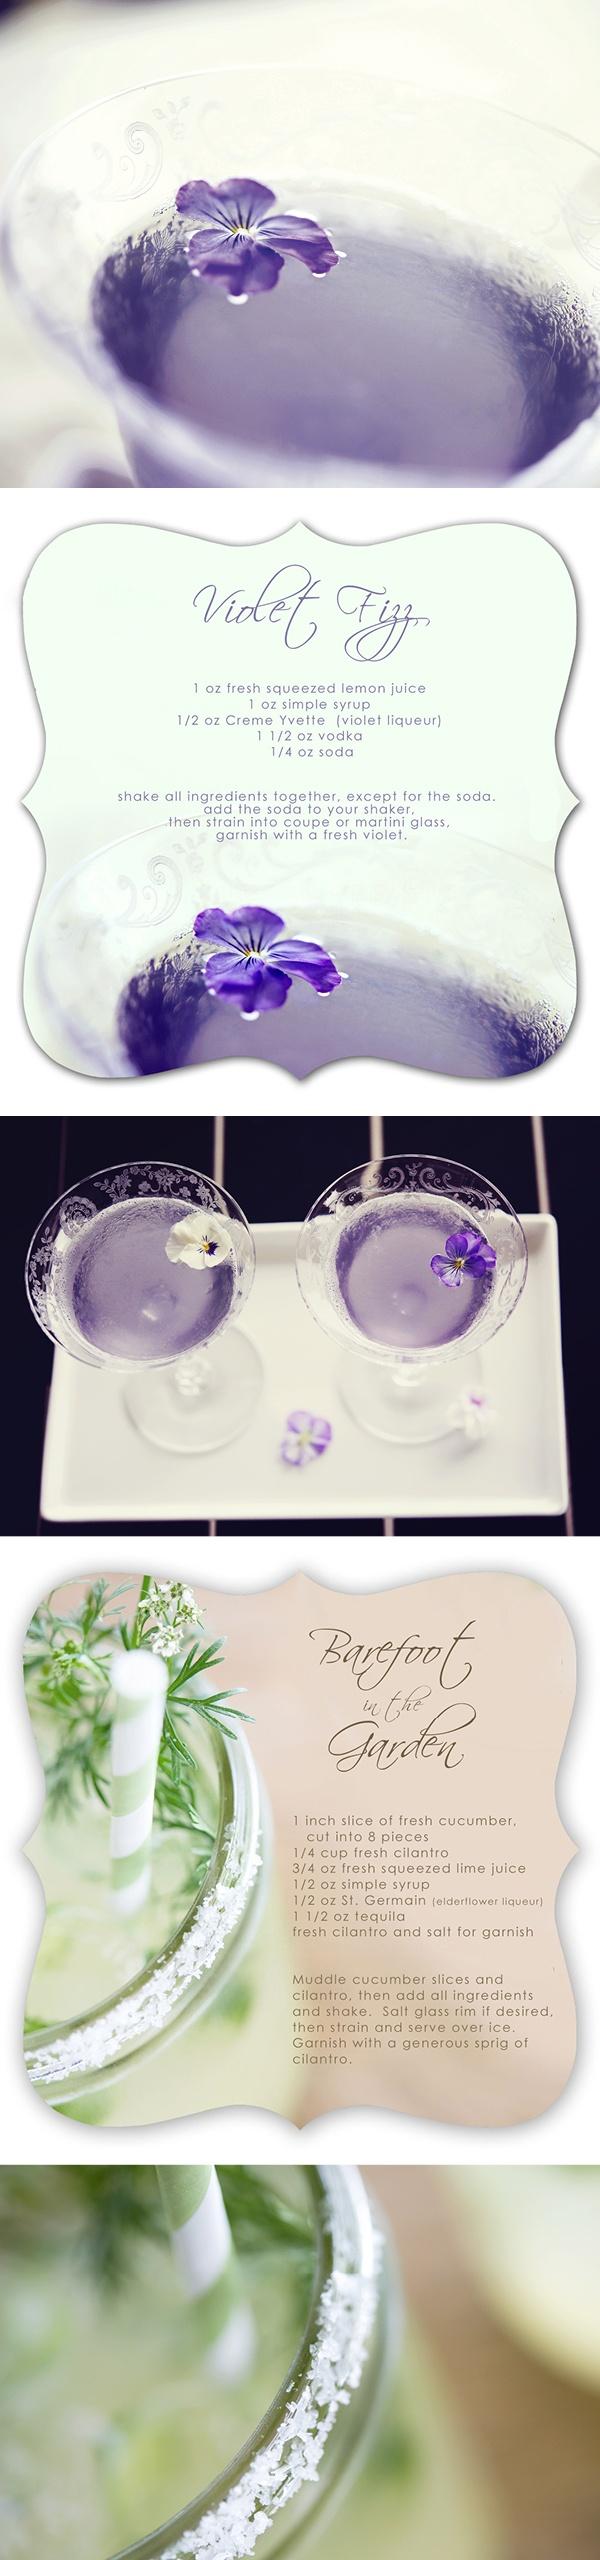 Steph-wedding-cocktails-purple-green